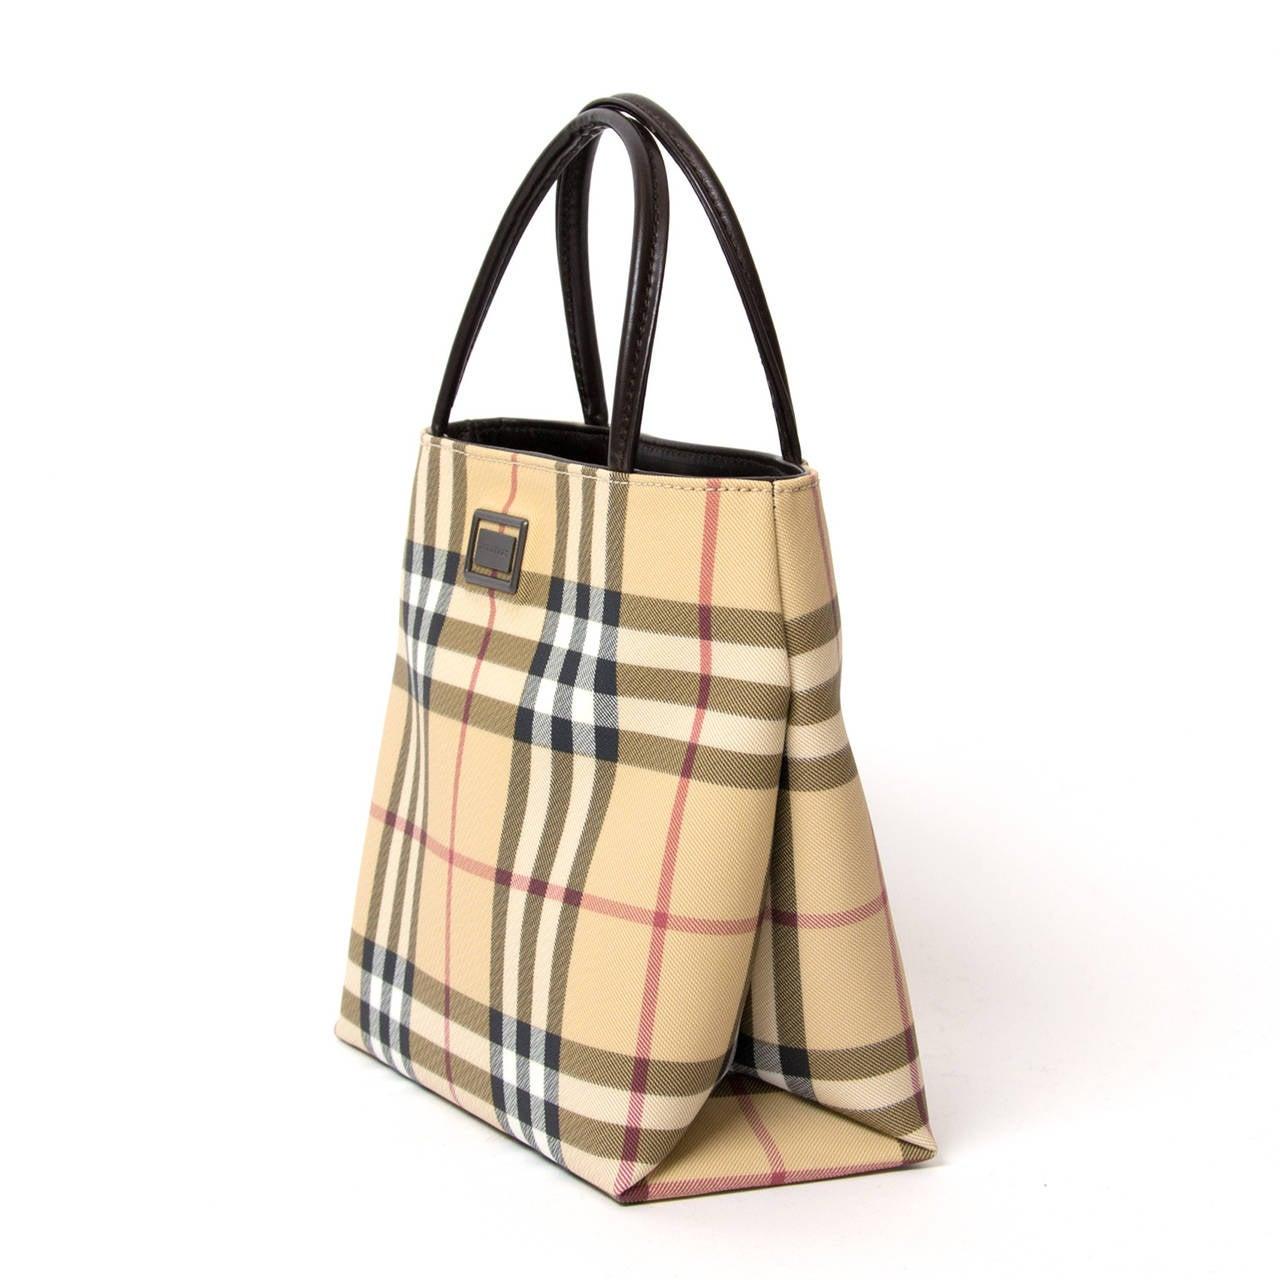 Burberry Coated canvas Nova Handbag. Dark Brown handles.  Magnetic closure, burberry interior lining, one inside zipper pocket.